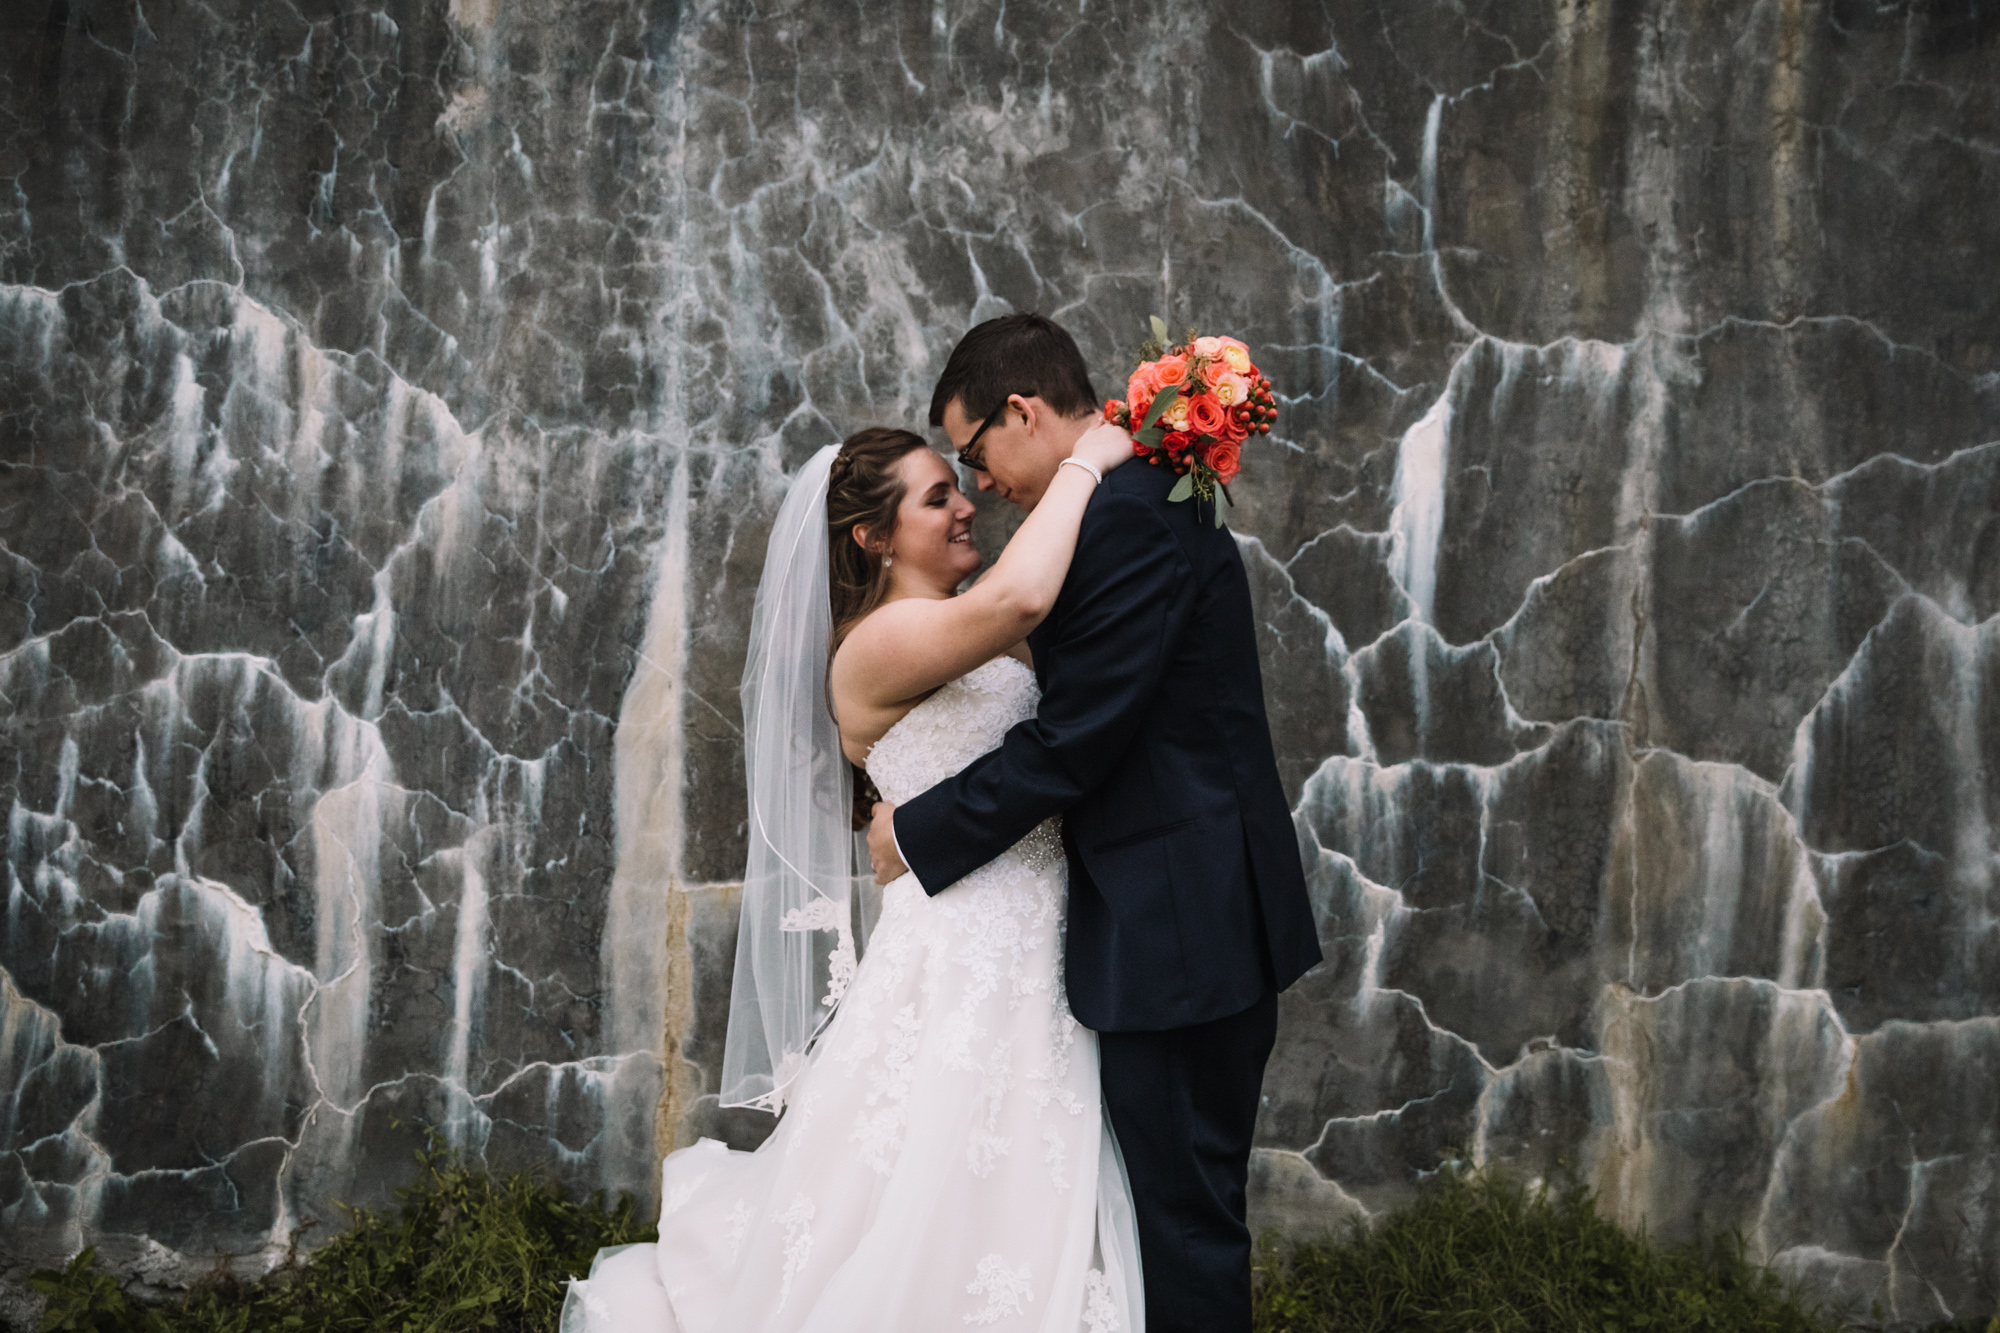 W&V_Wedding_Portraits-13.jpg